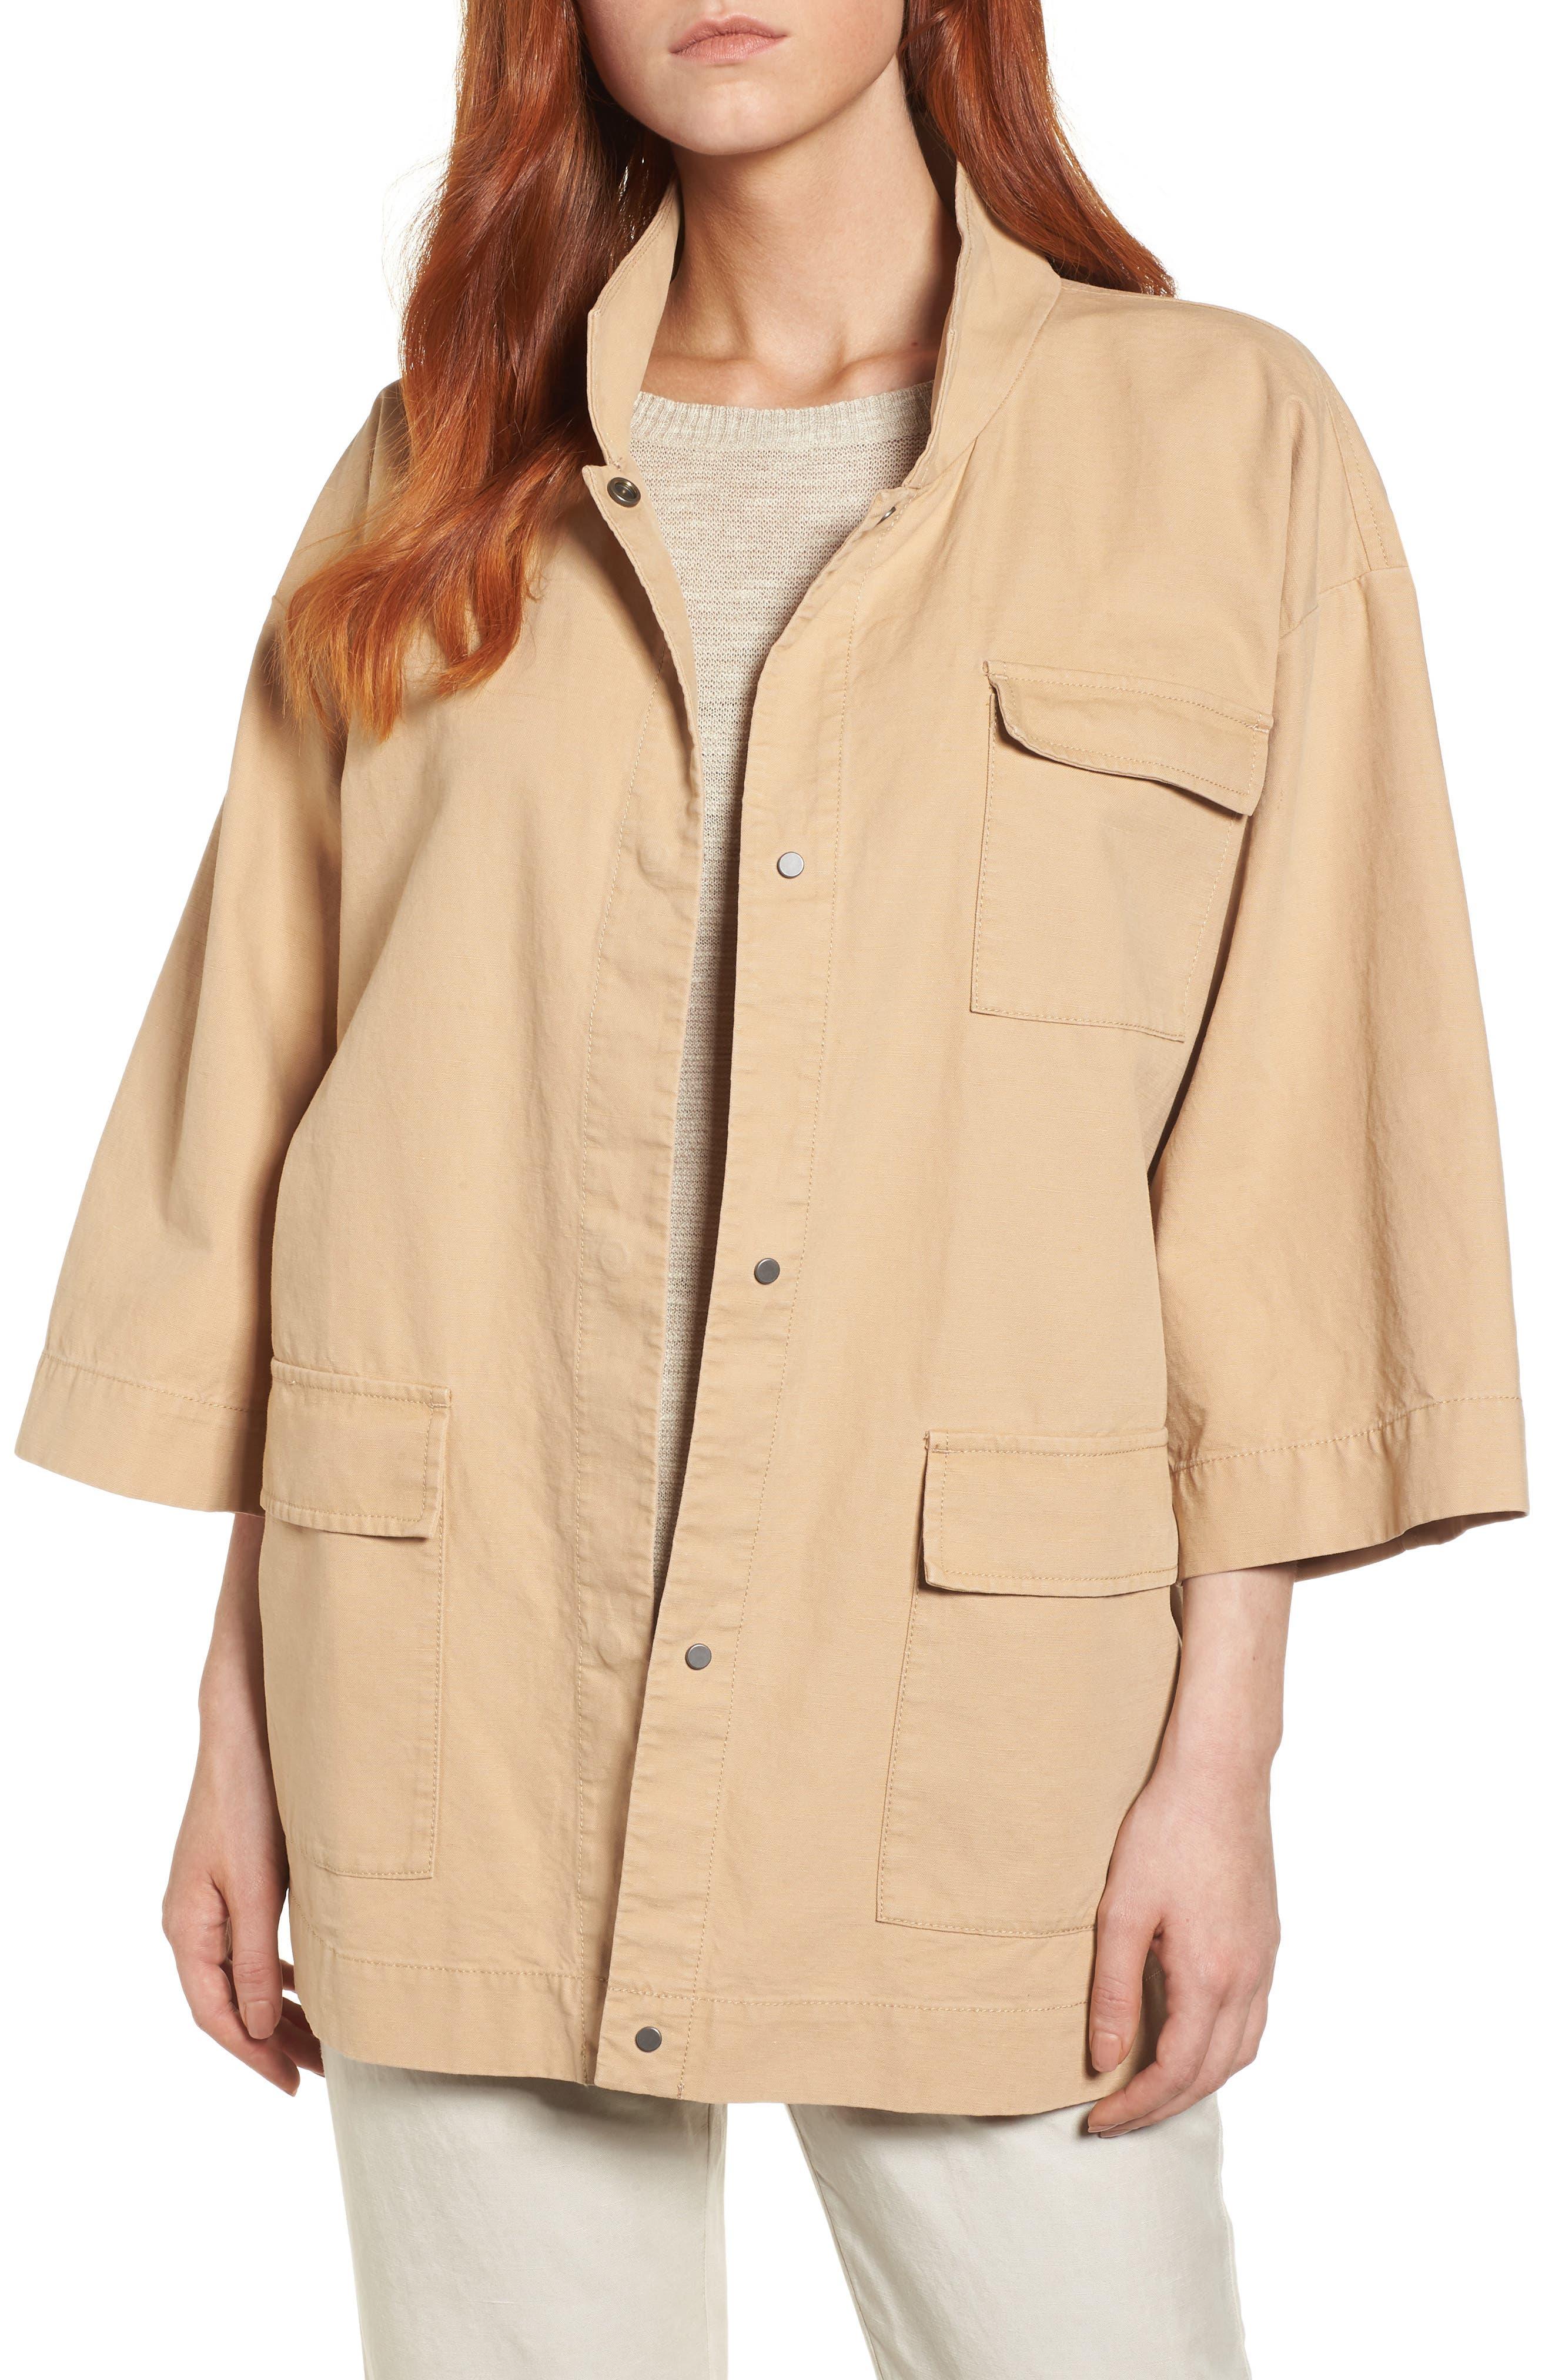 Organic Cotton & Hemp Jacket,                         Main,                         color, Wheat